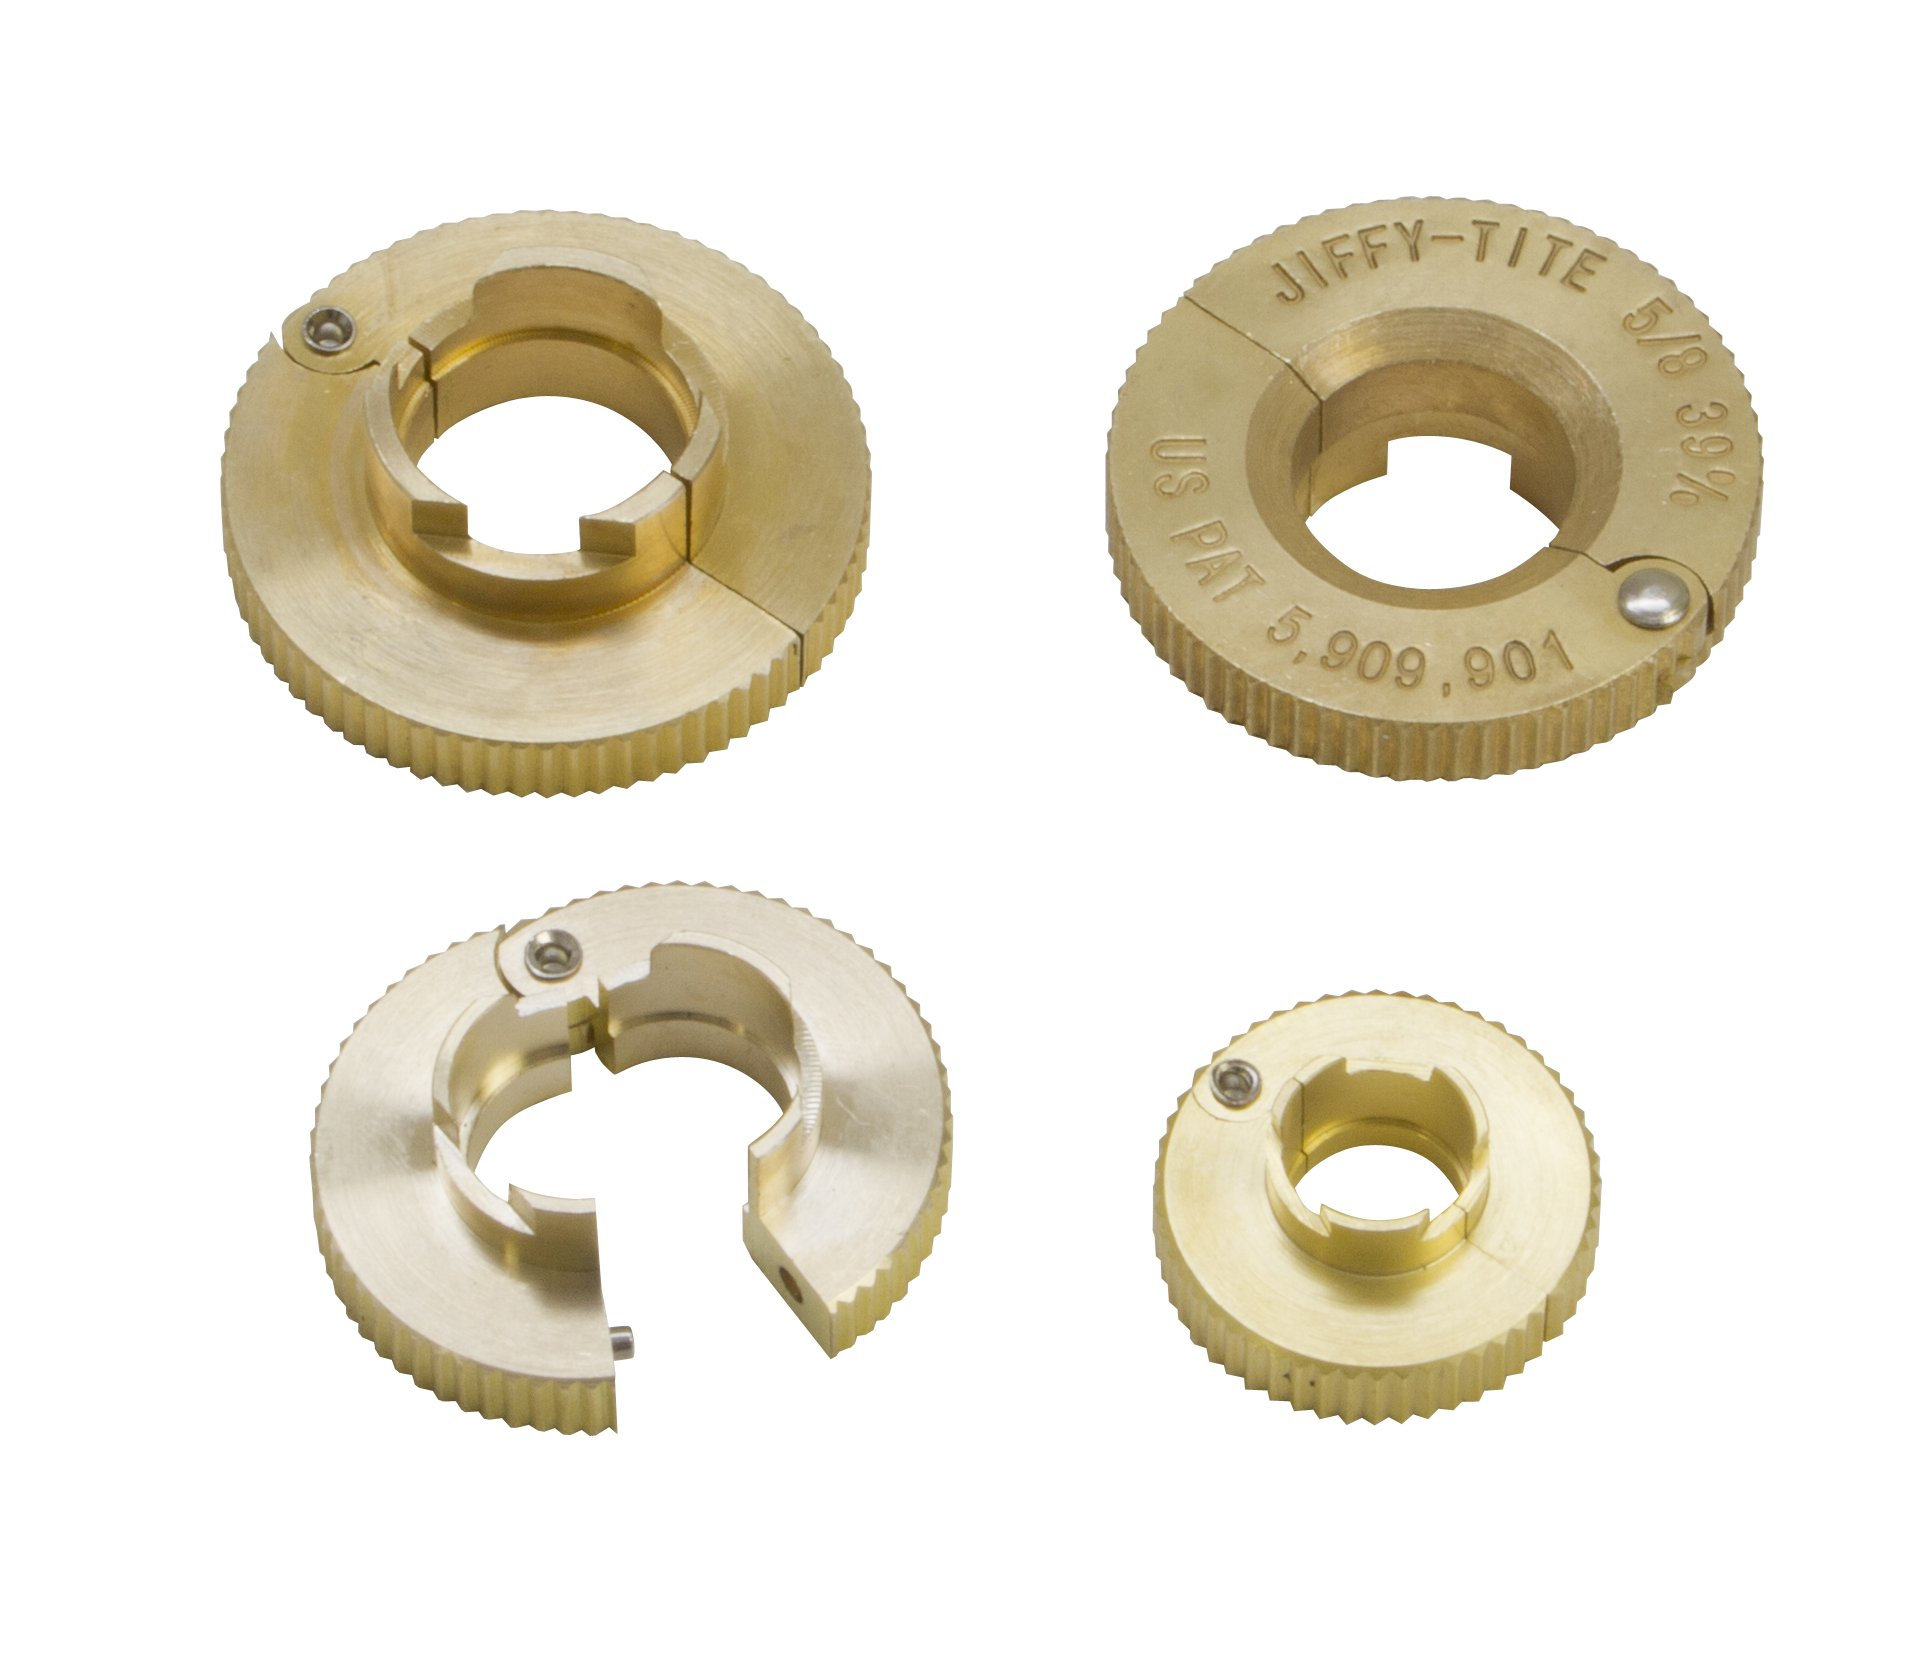 Lisle 22990 Jiffy-Tite 4-Piece Low Profile Disconnect Set